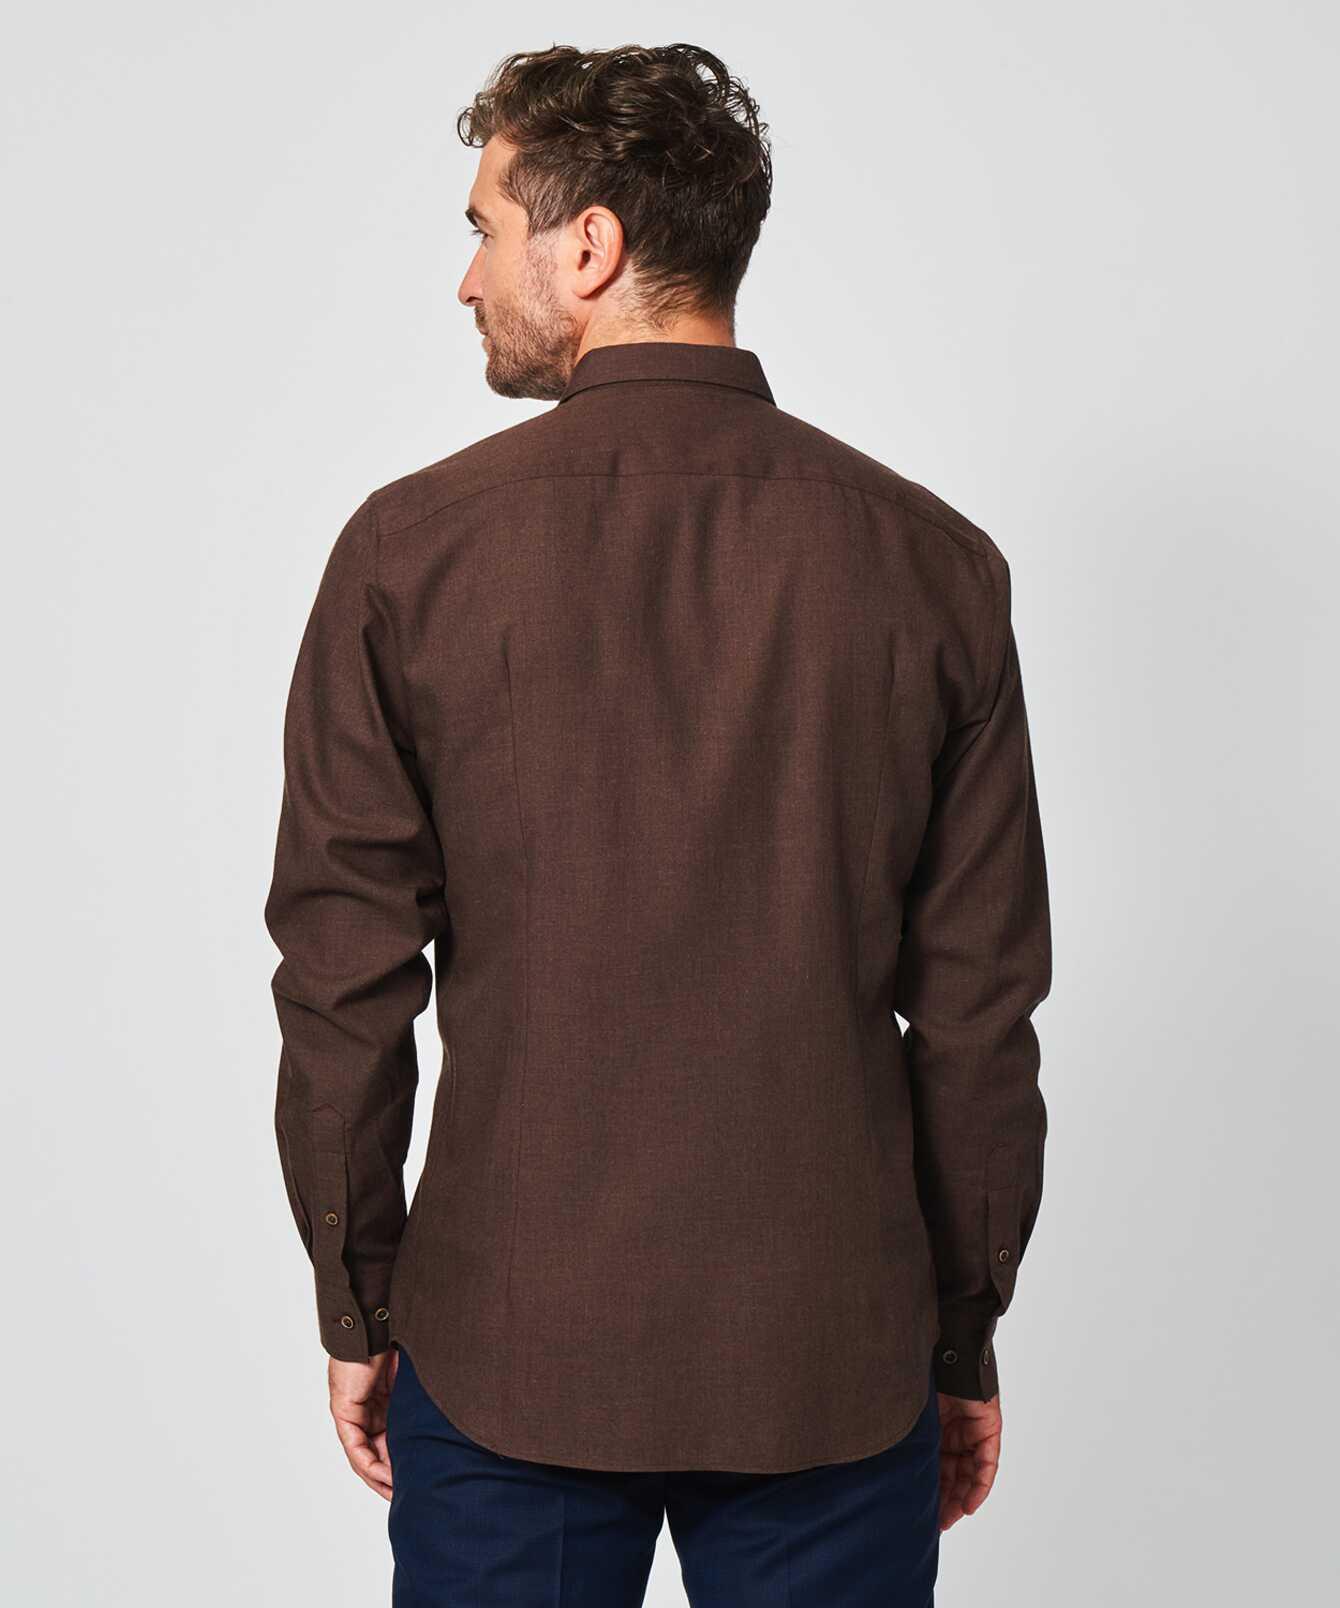 Skjorta Costello Mörkbrun The Shirt Factory